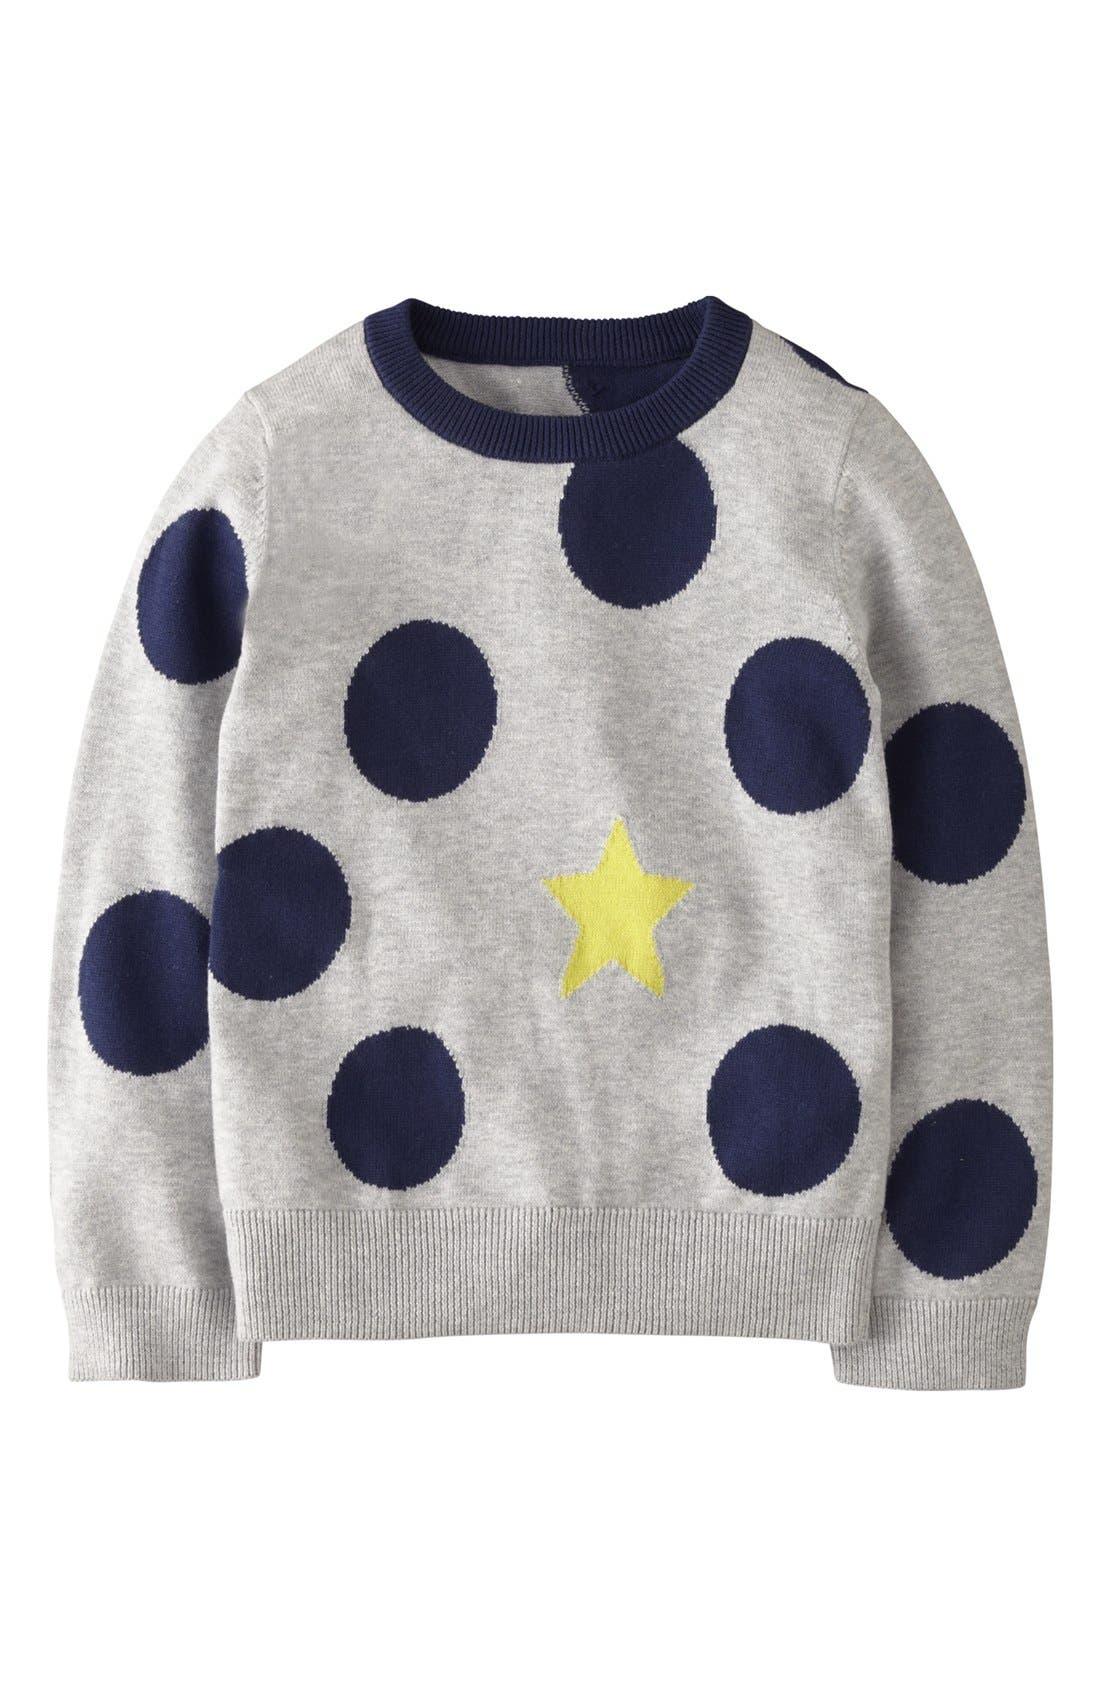 Alternate Image 1 Selected - Mini Boden Intarsia Sweater (Little Girls & Big Girls)